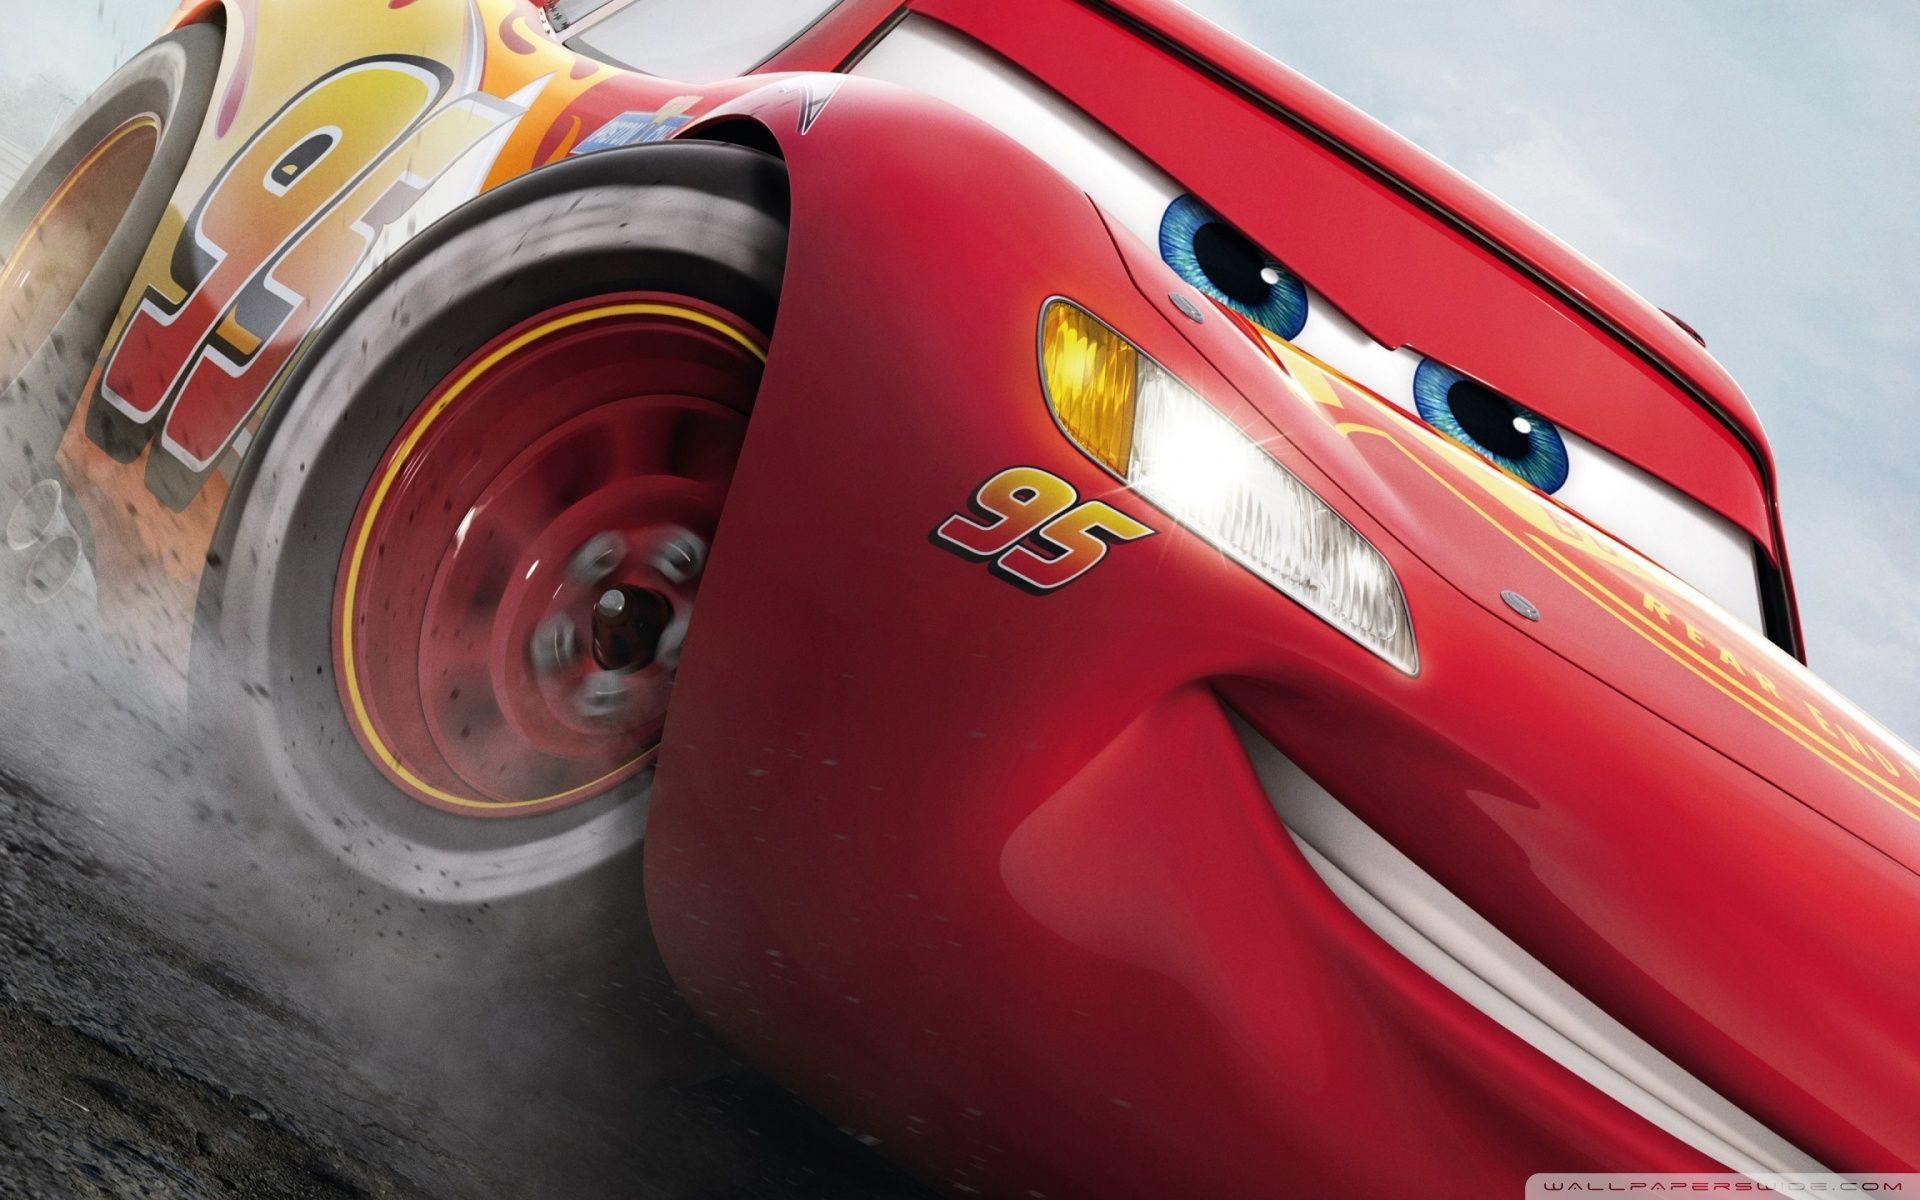 Pin By Meeghan Petrilla On Disney Cars Cars 3 Lightning Mcqueen Cars Movie Lightning Mcqueen